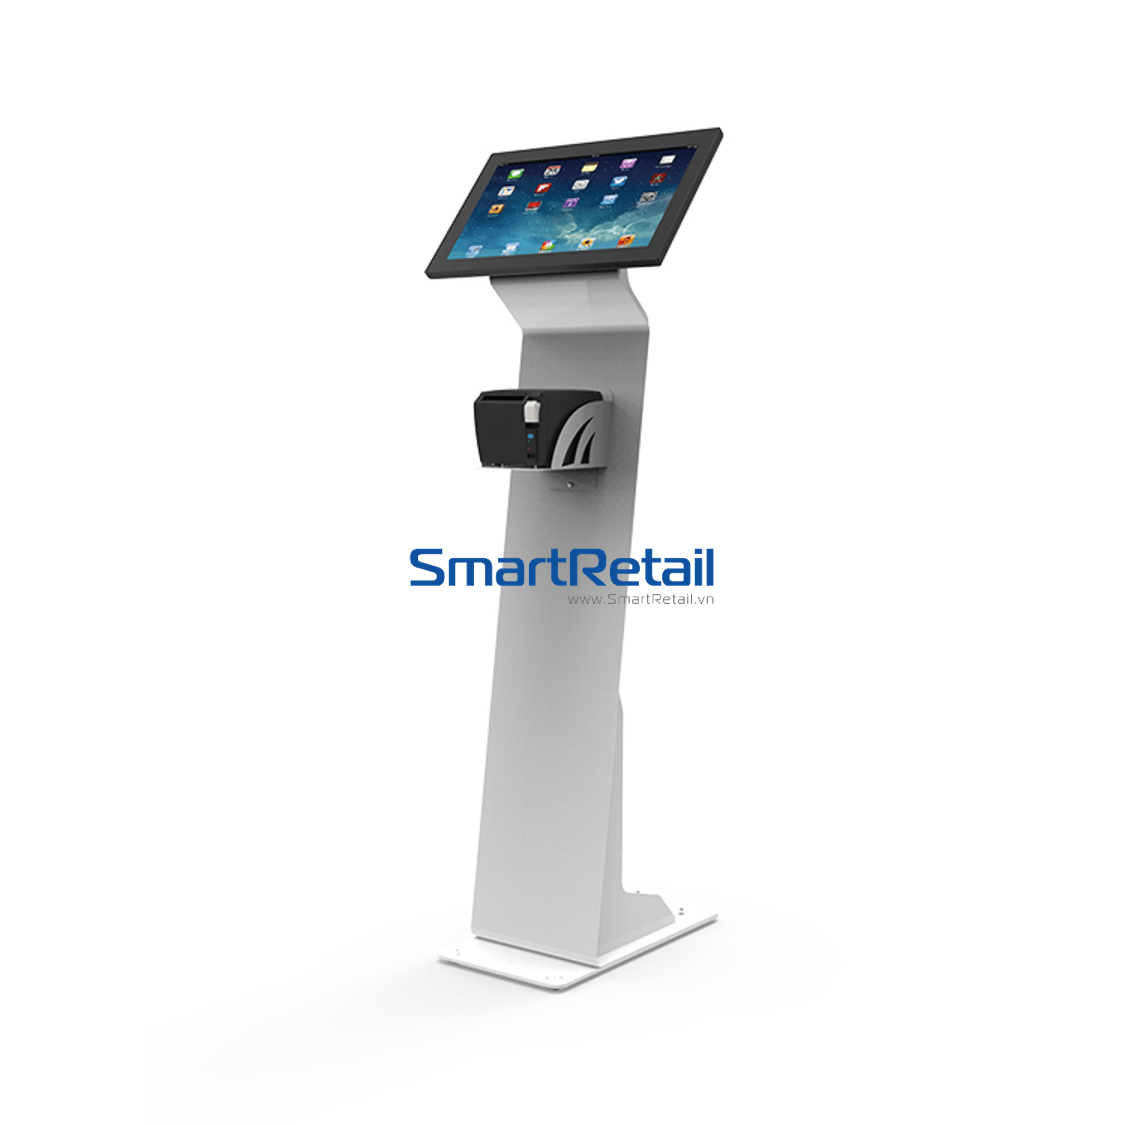 SmartRetail Kiosk Order SF 202 2